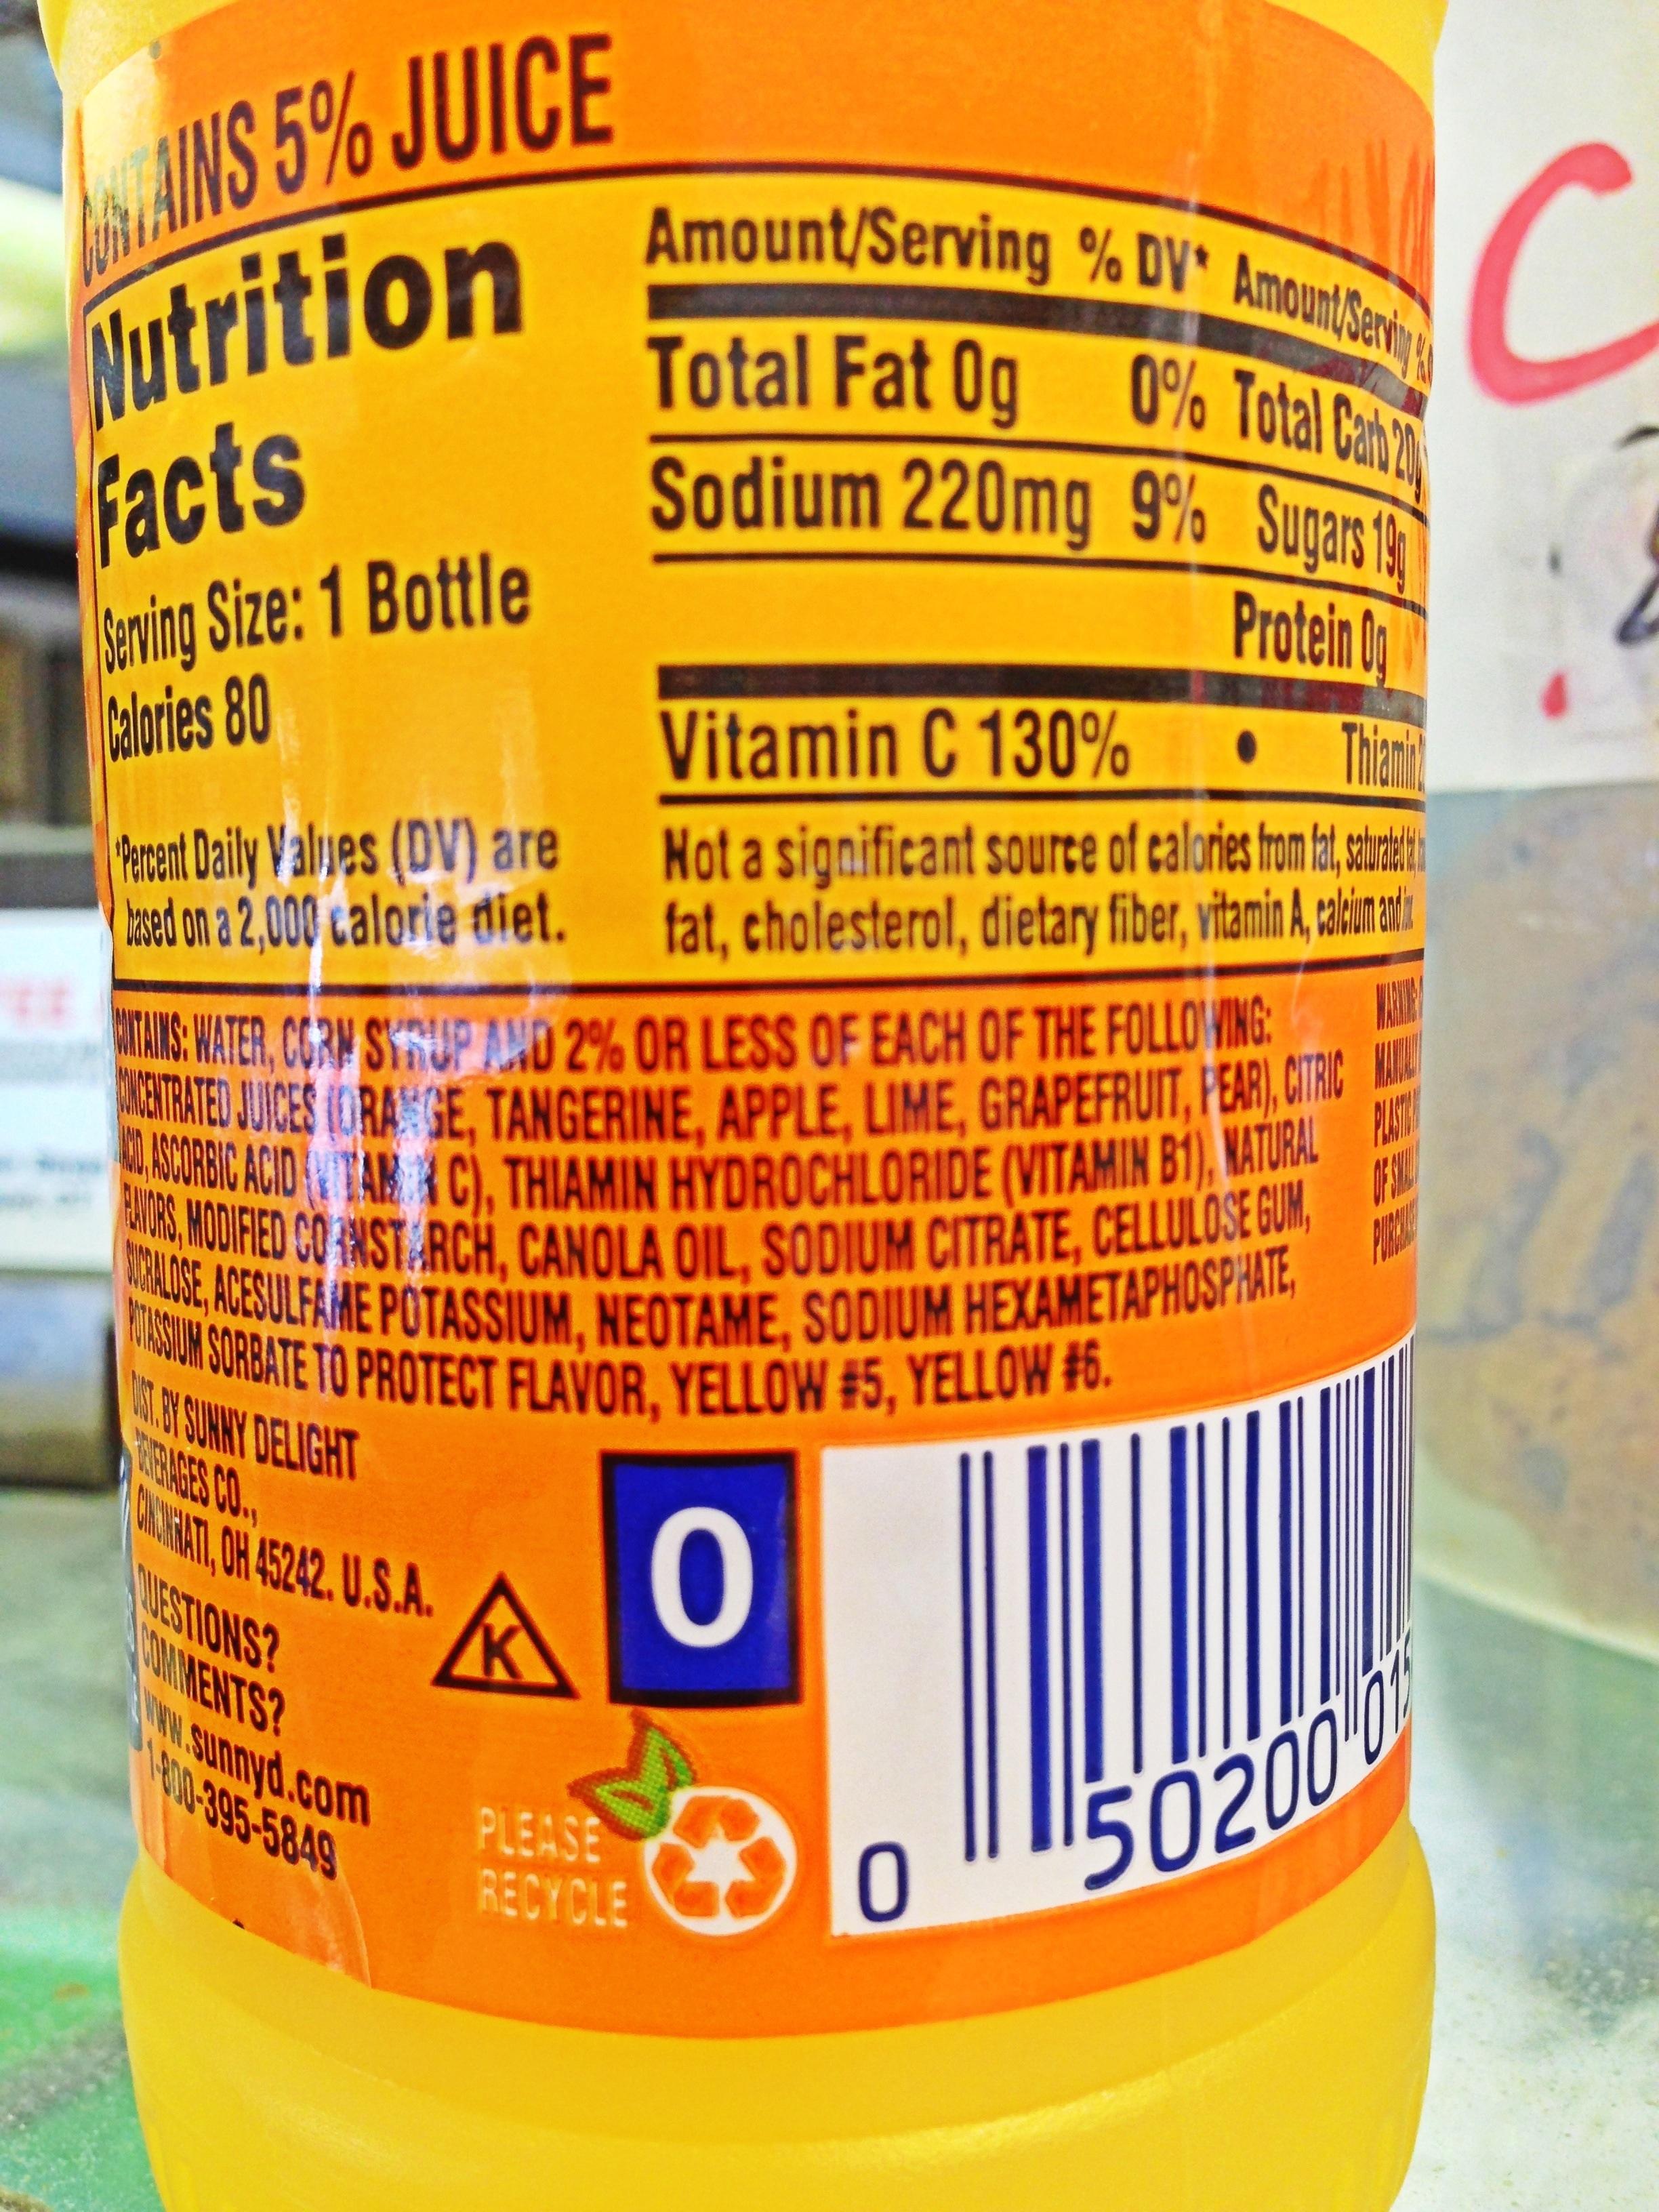 Nutrition Labels For Fast Food Restaurants